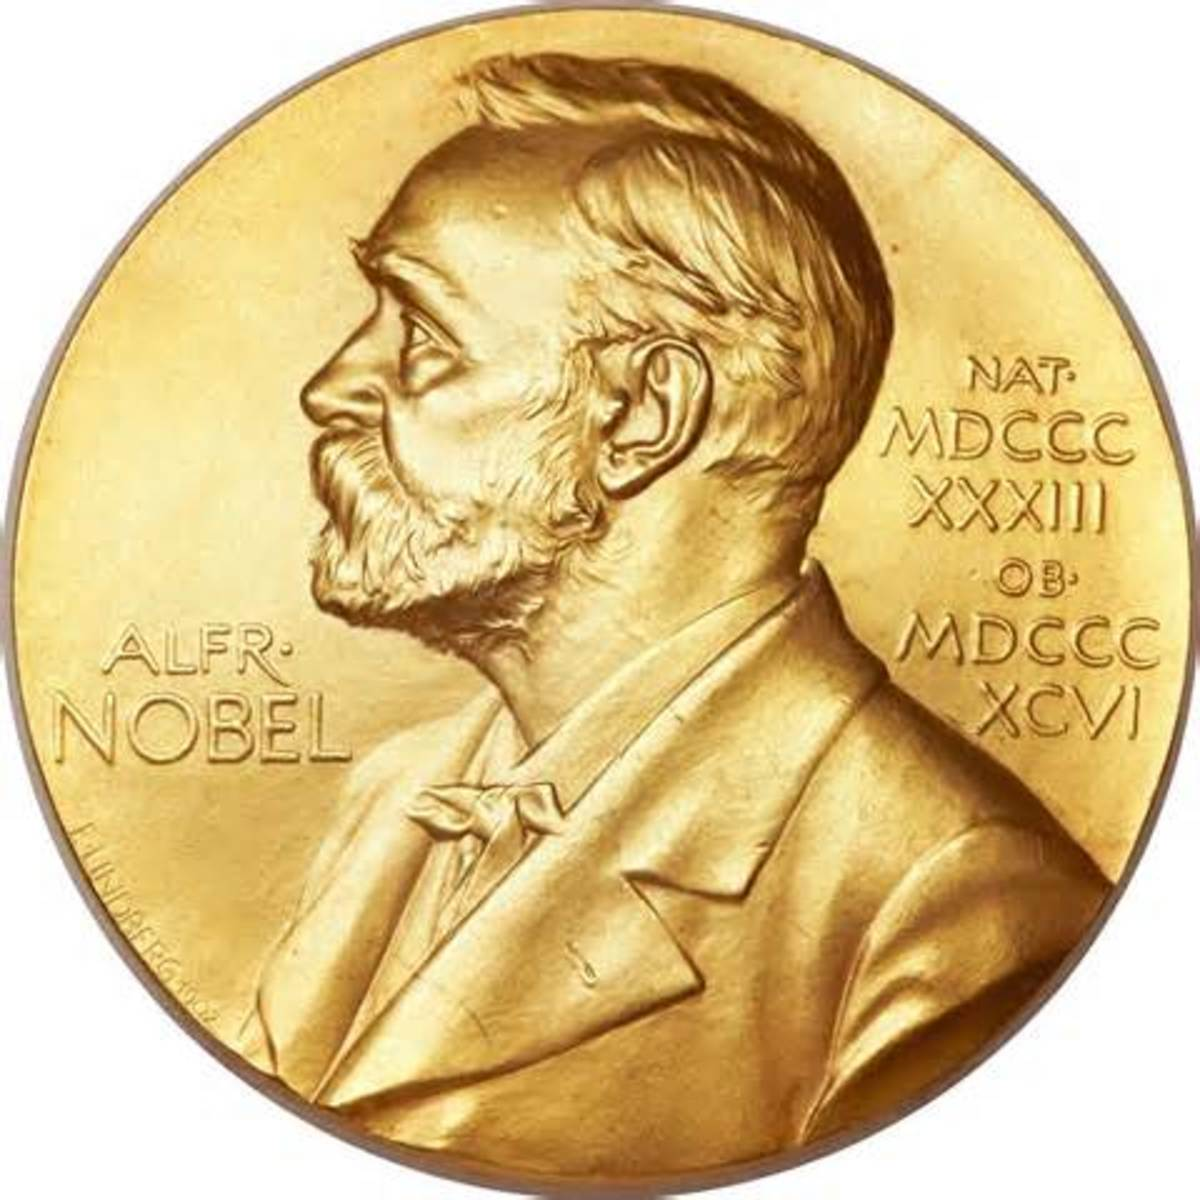 Nobel Prize Face